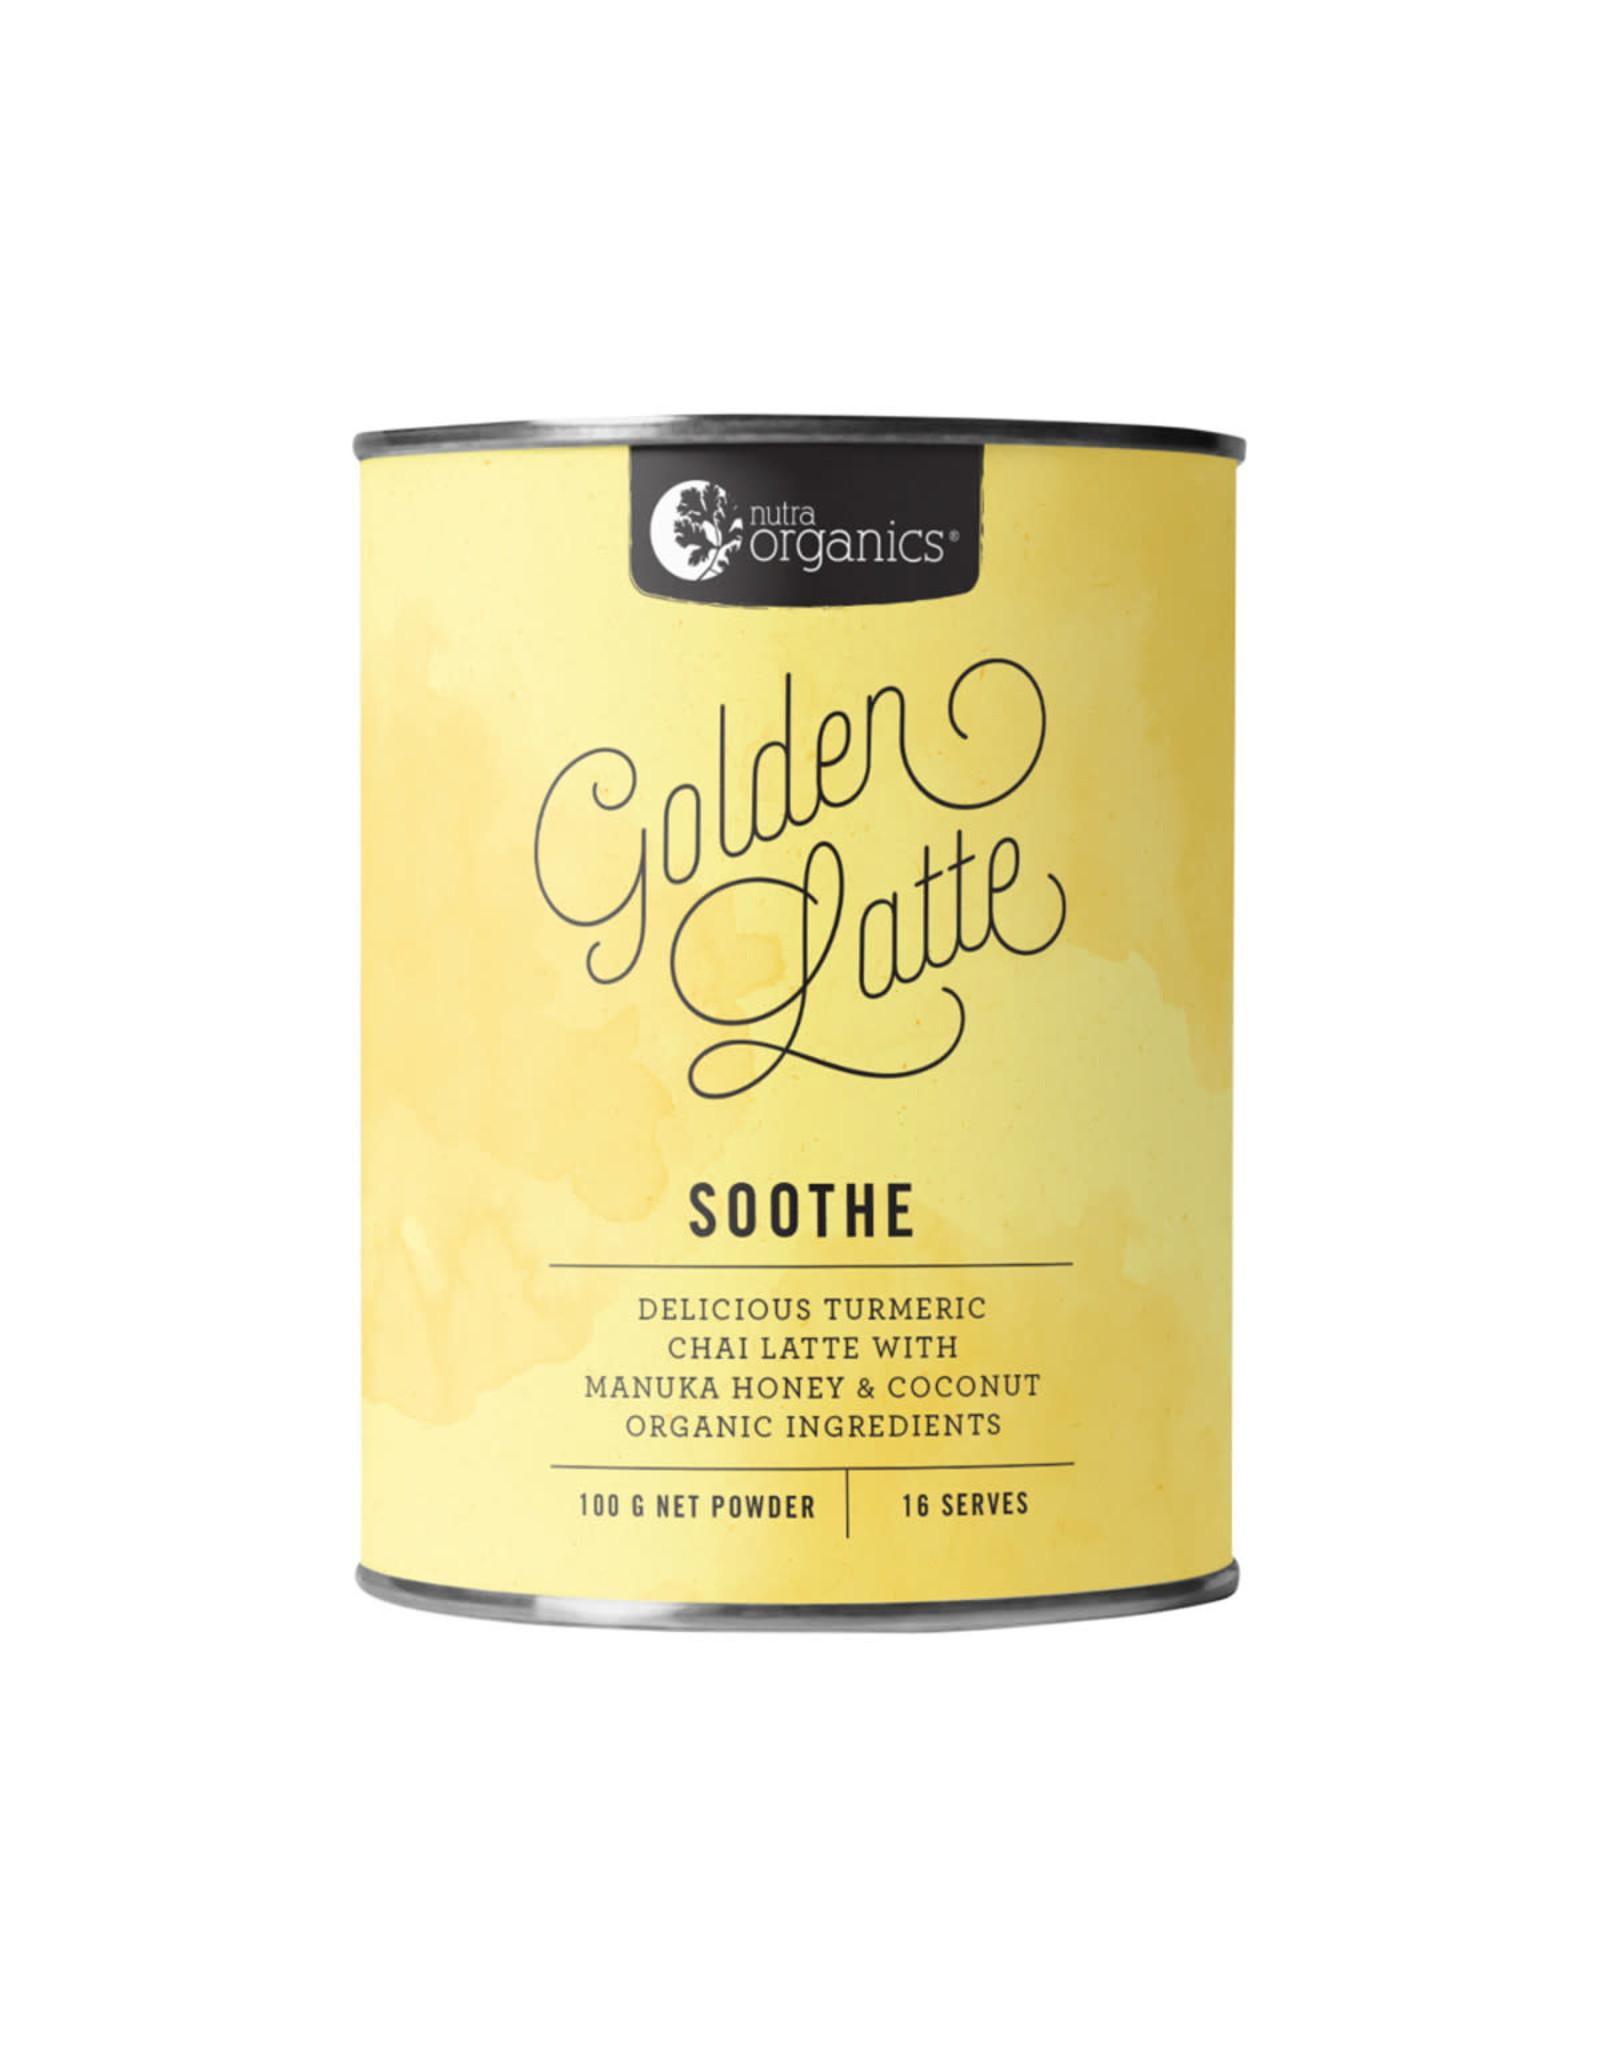 NutraOrganics Golden Latte 100g